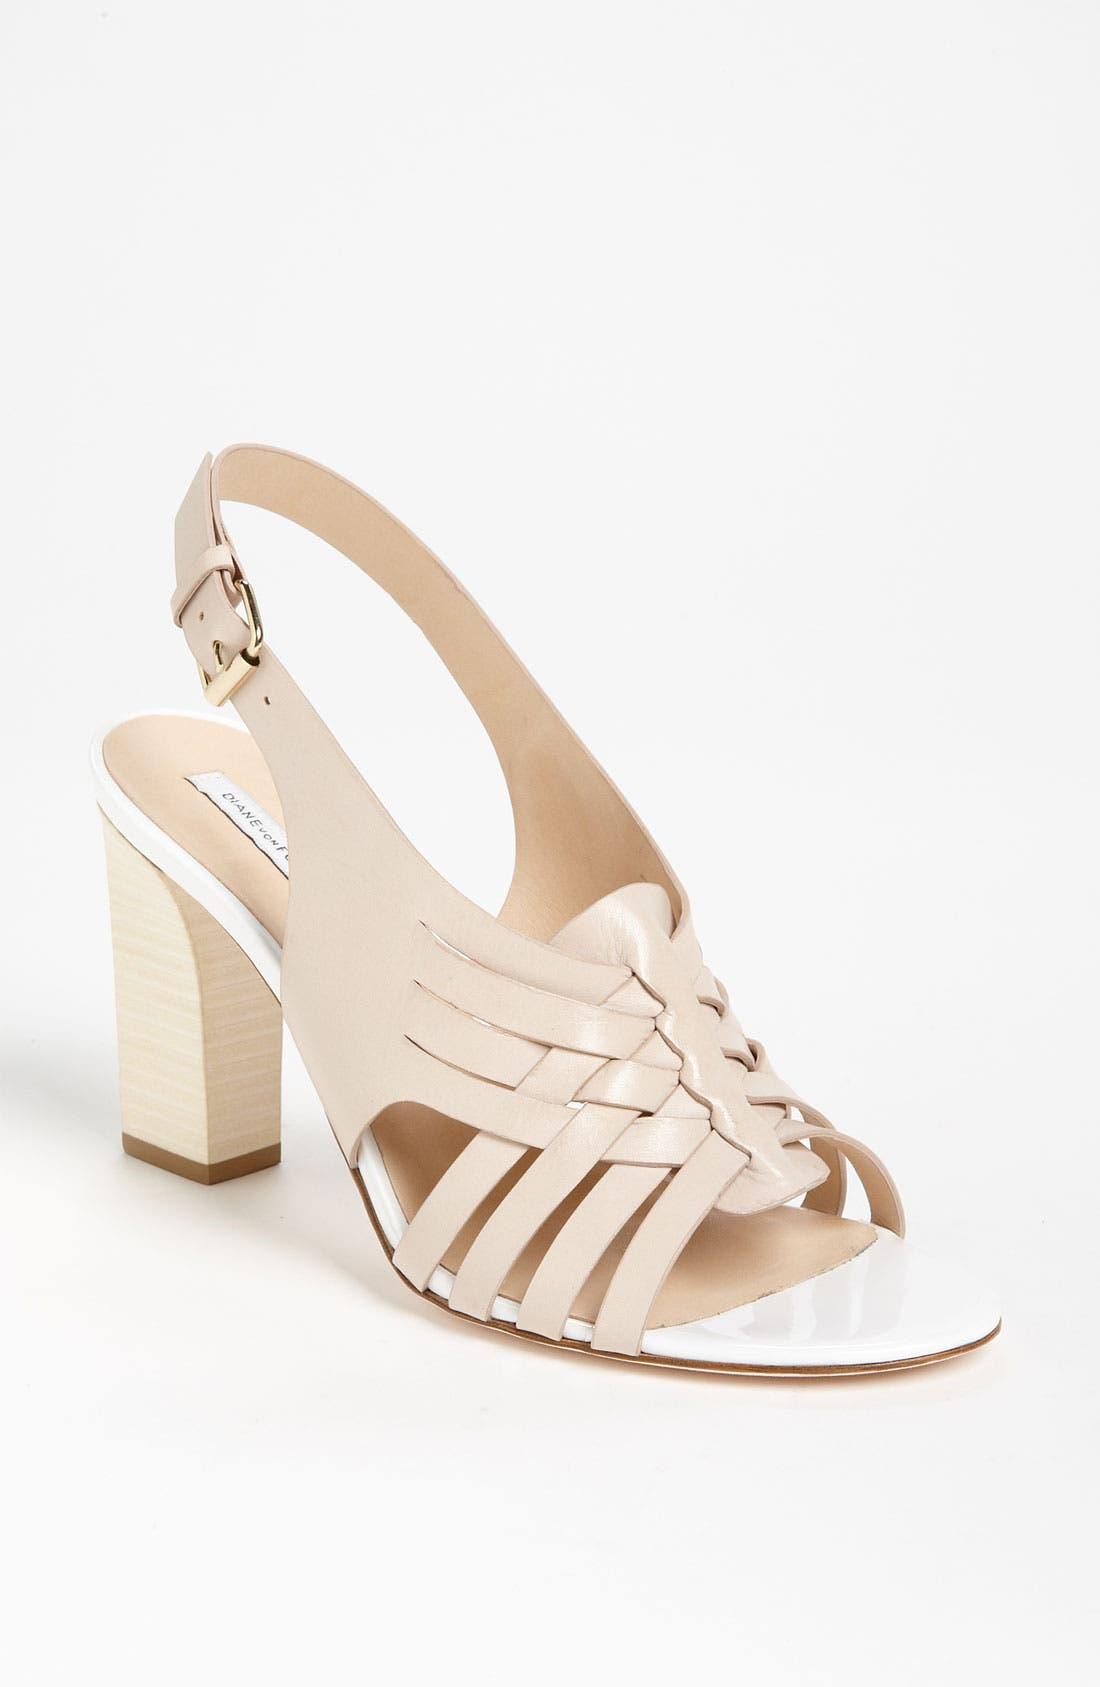 Alternate Image 1 Selected - Diane von Furstenberg 'Taite' Sandal